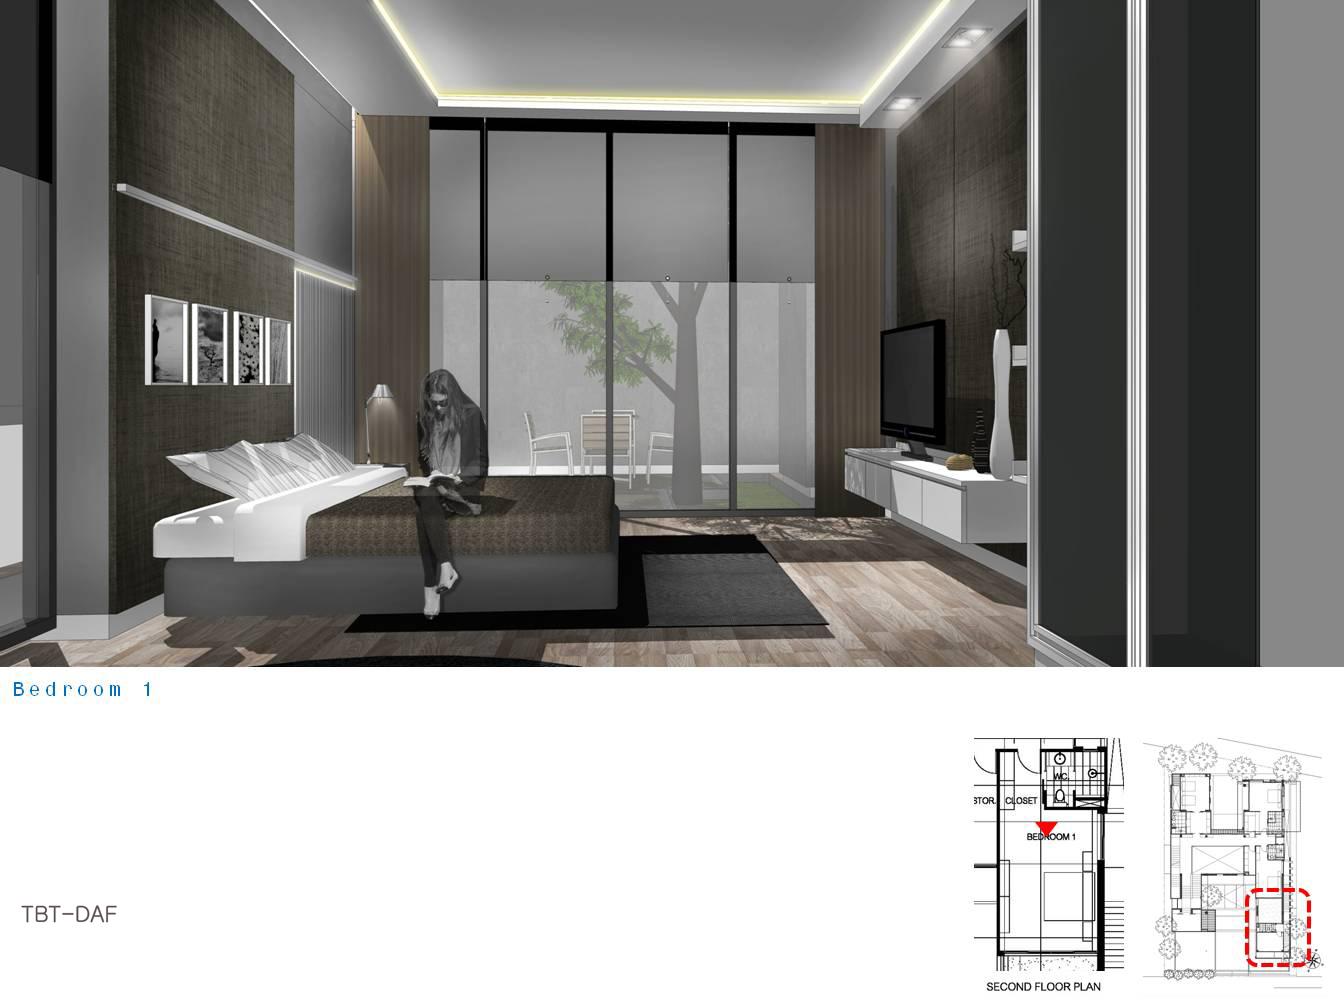 TBT-DAF interior design house robinson 20